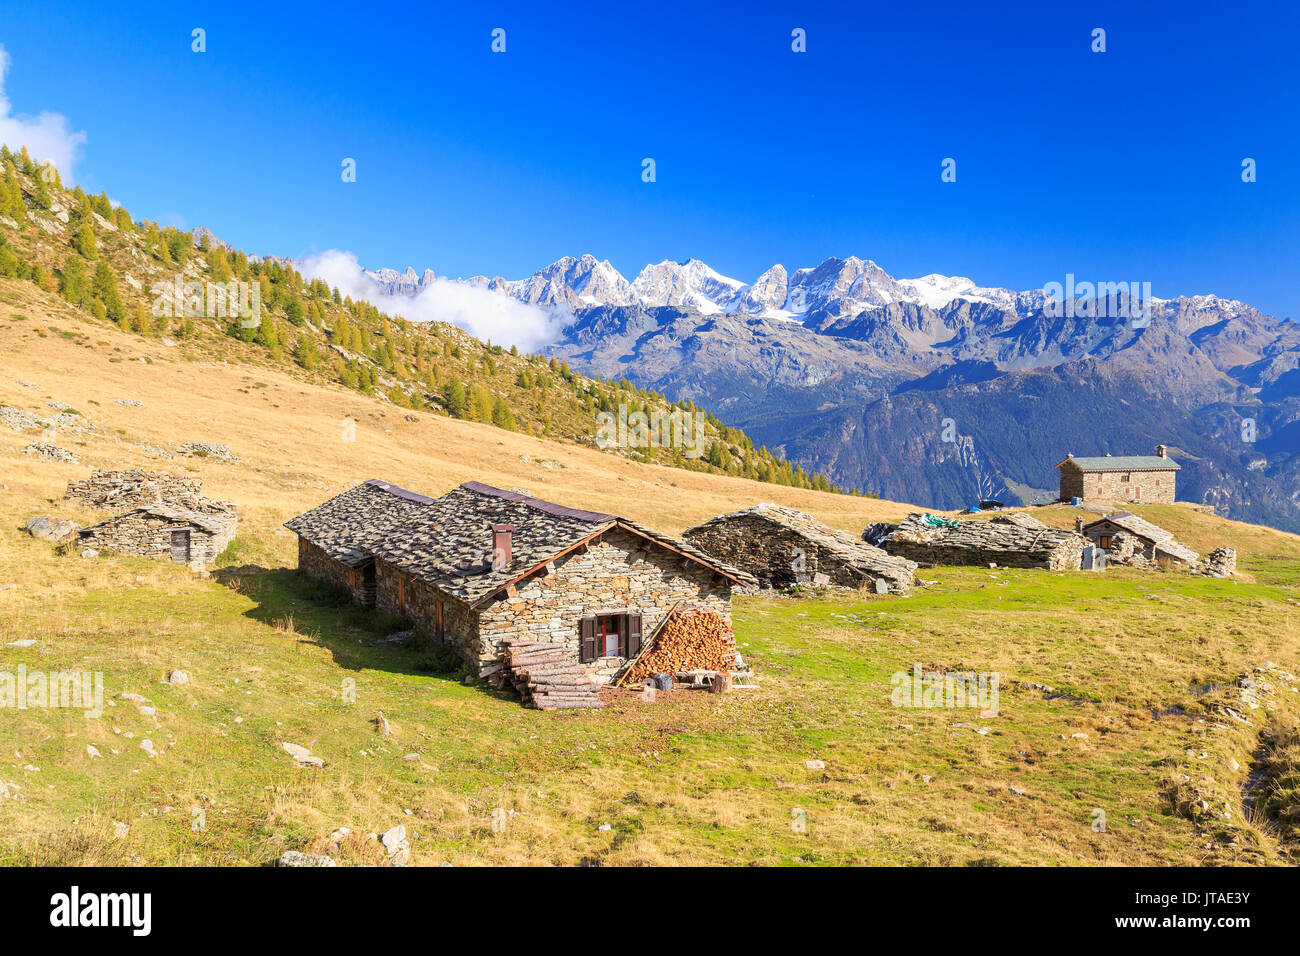 Alpine huts framed by snowy peaks of Bernina Group, Arcoglio Alp, Val Torreggio, Malenco Valley, Valtellina, Lombardy, Italy - Stock Image